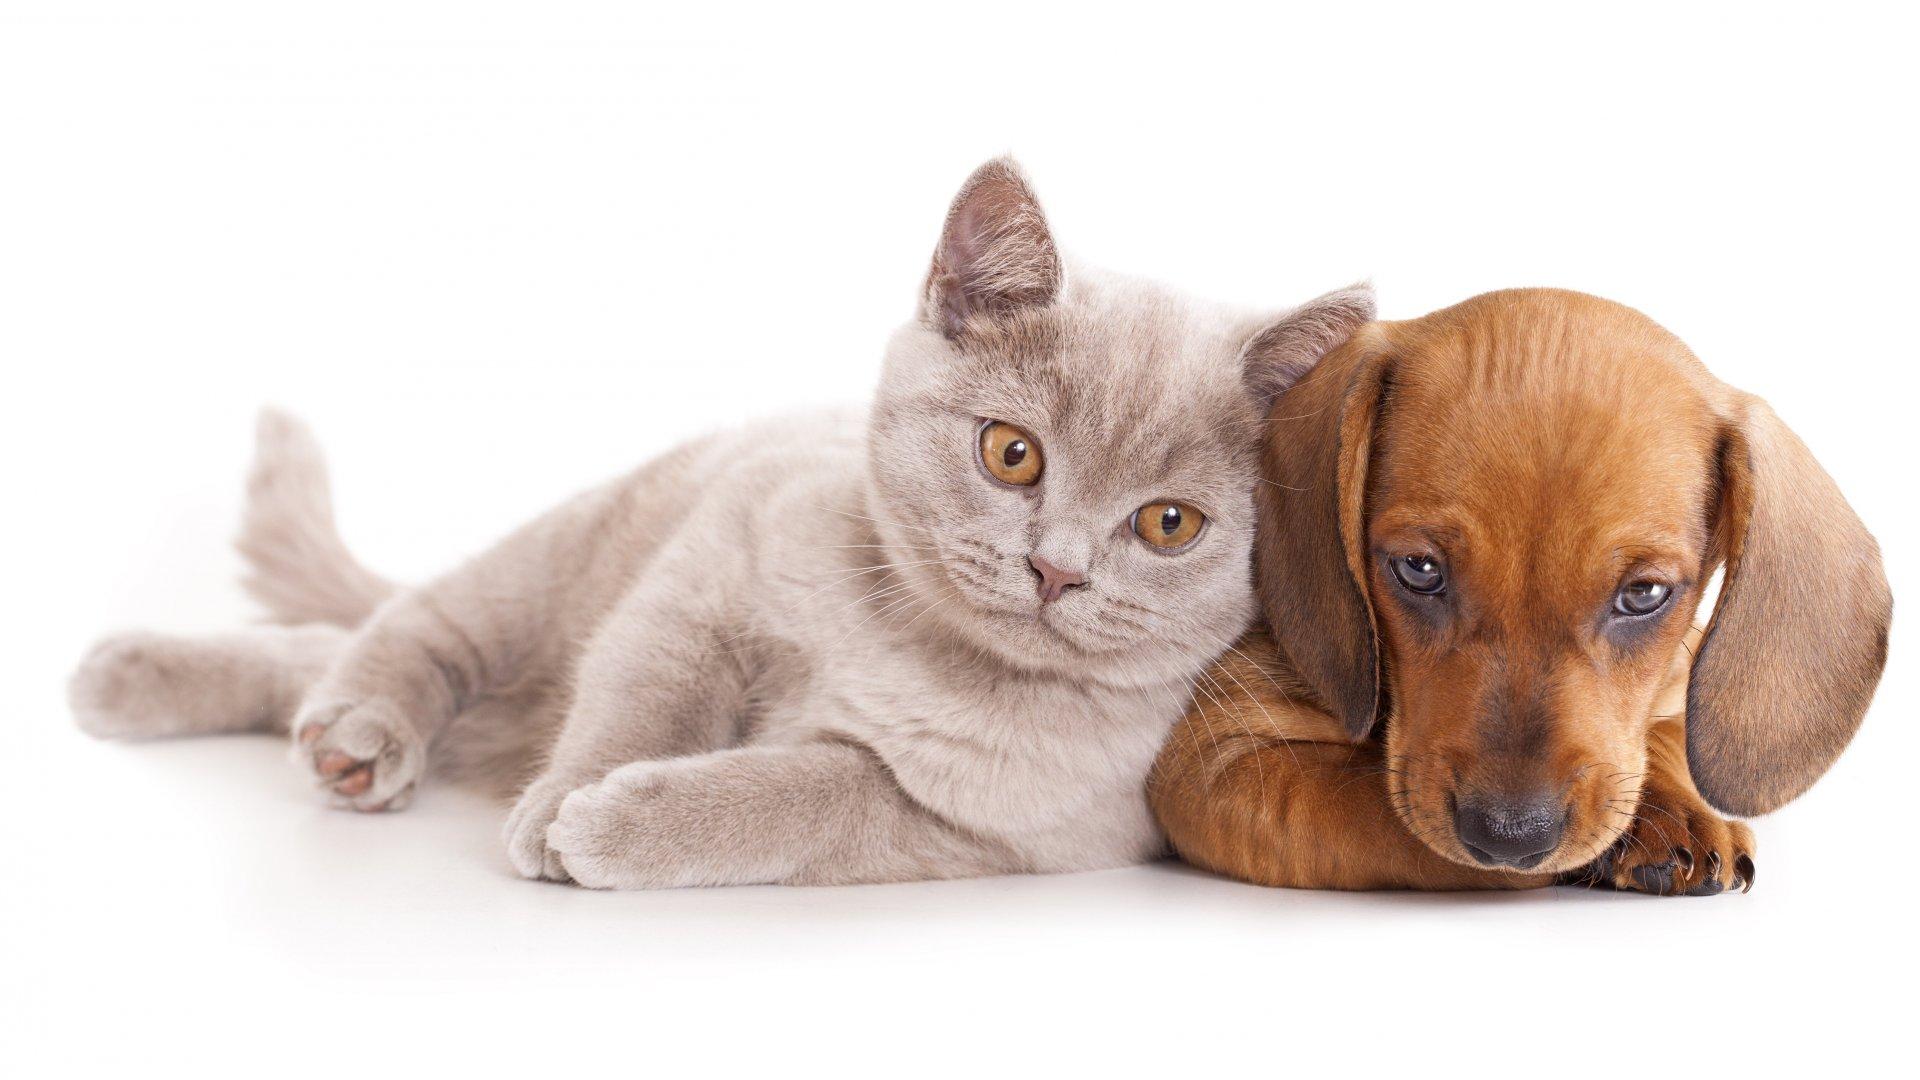 Cute Dog and Cat Wallpaper HD 1920x1080